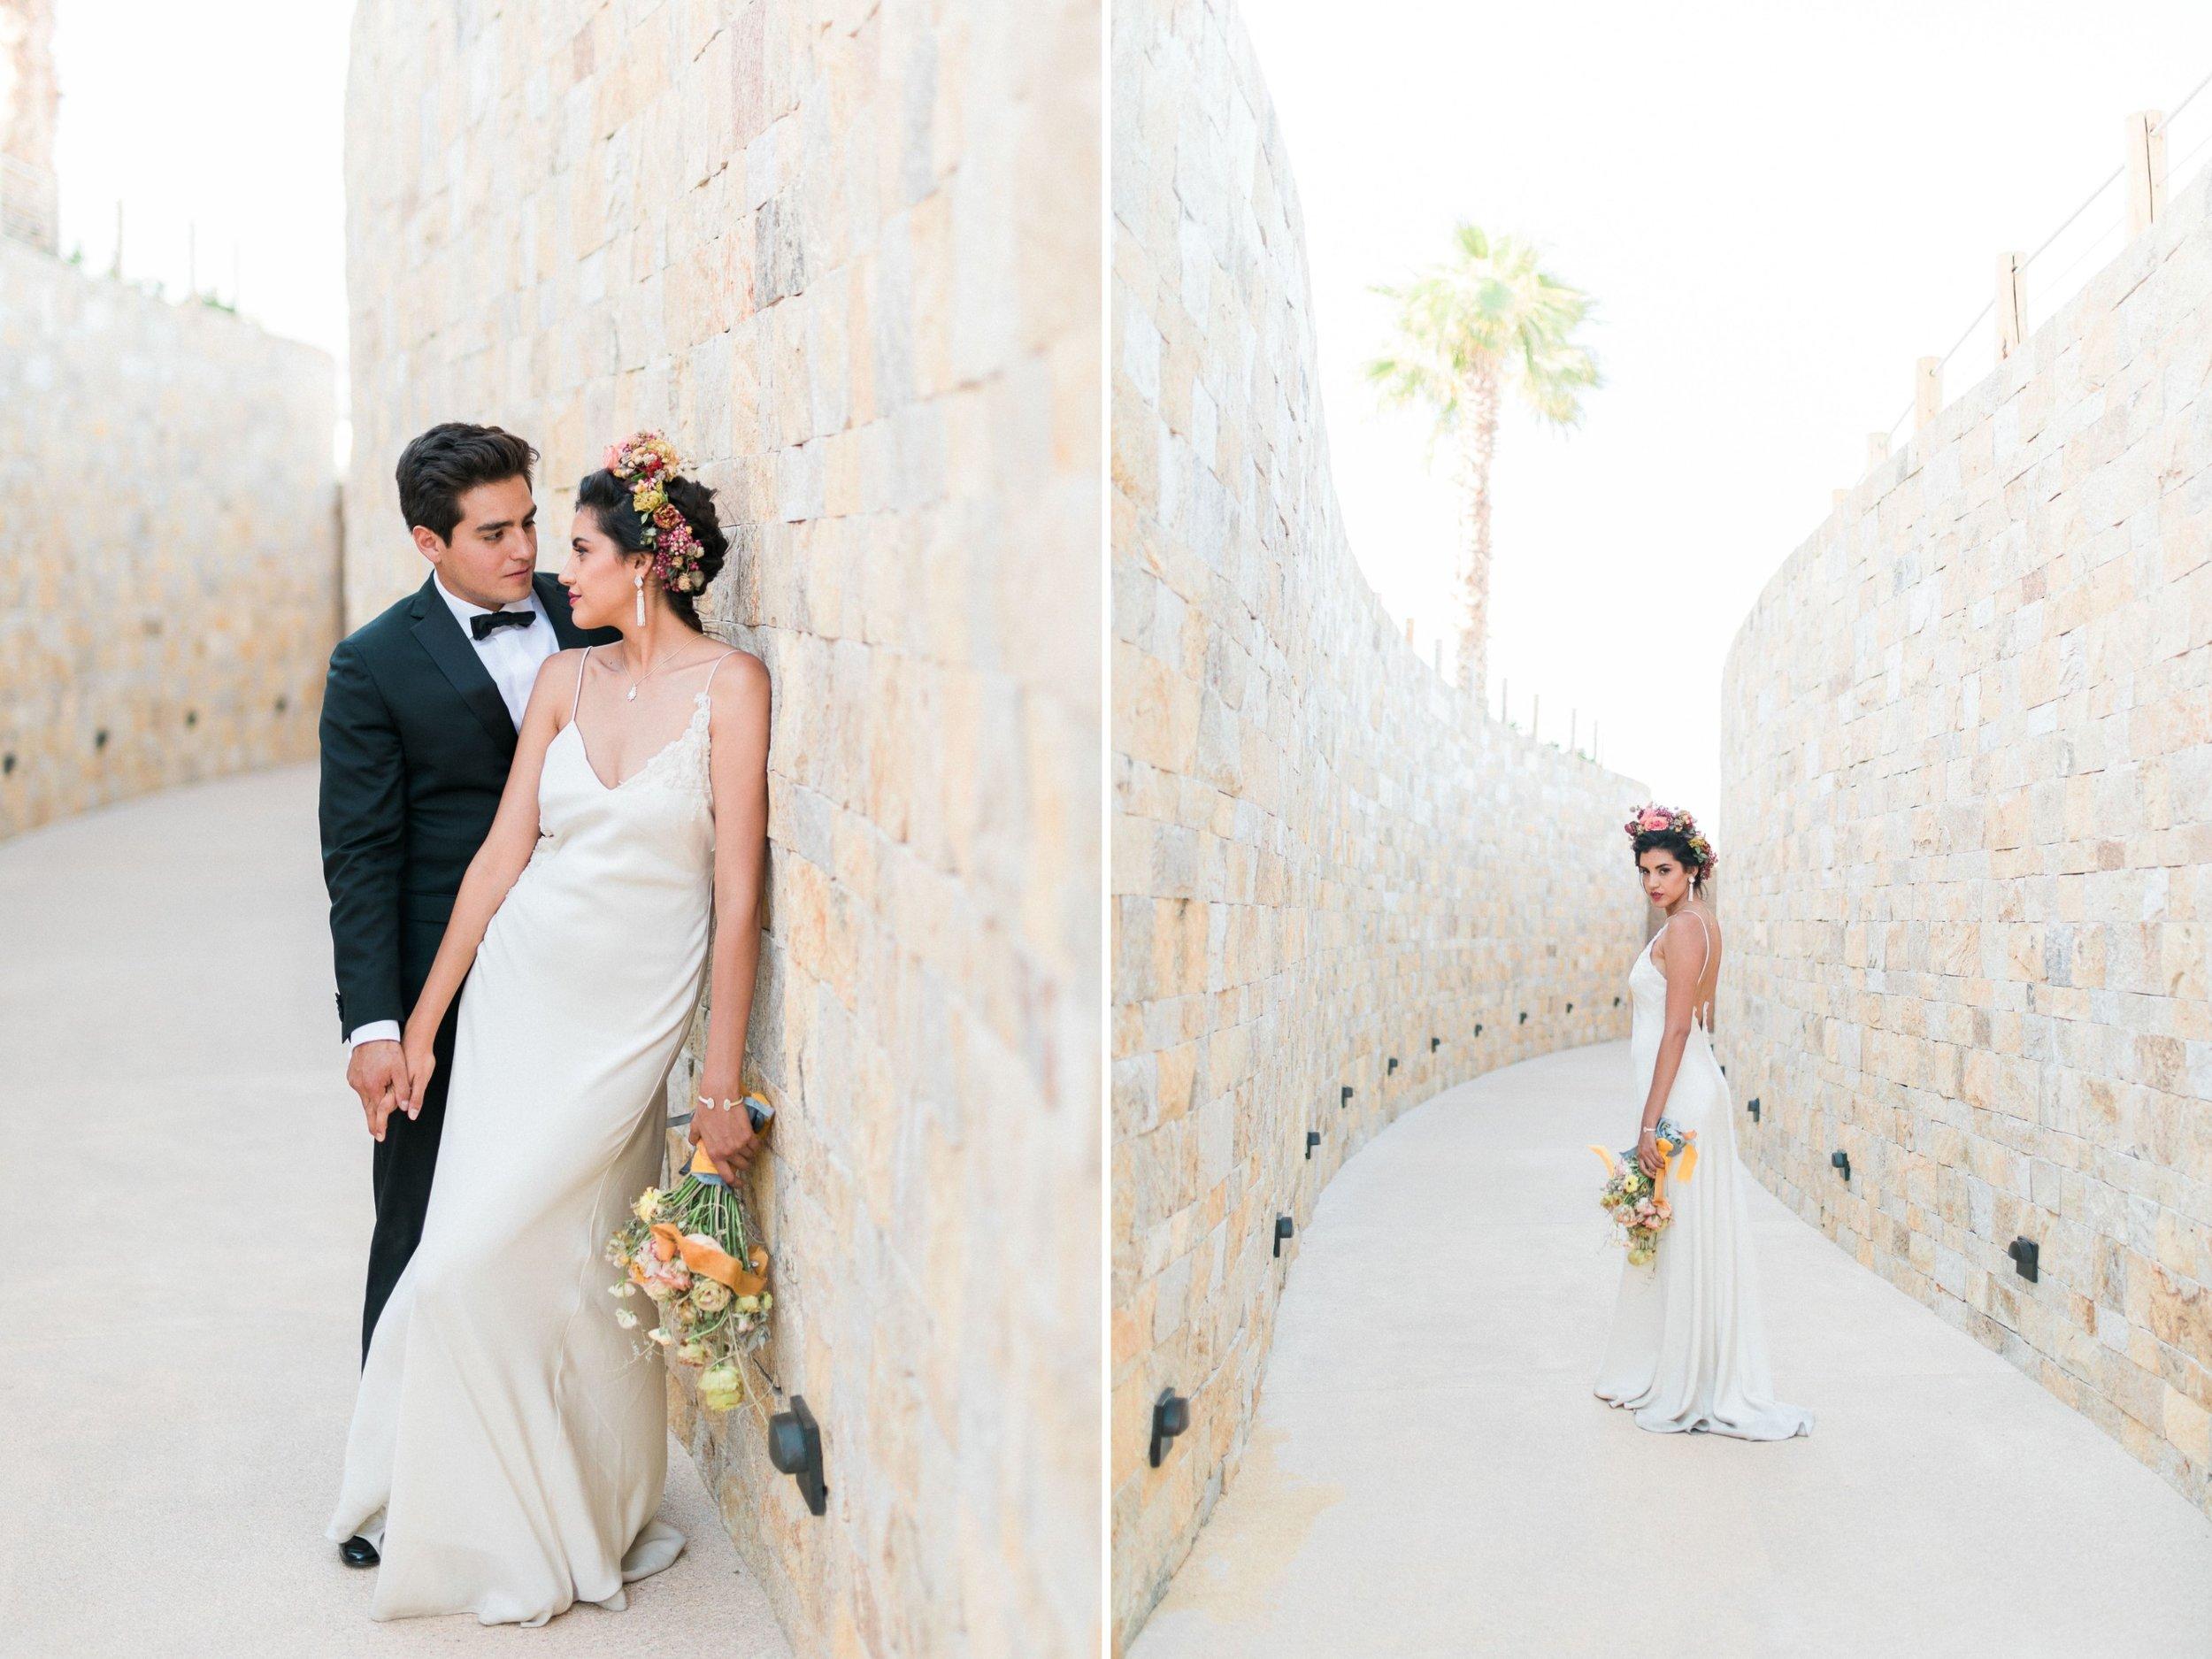 Los Cabos Wedding Photographer - Destination Wedding - Chileno Bay Resort Wedding Photos (15).jpg